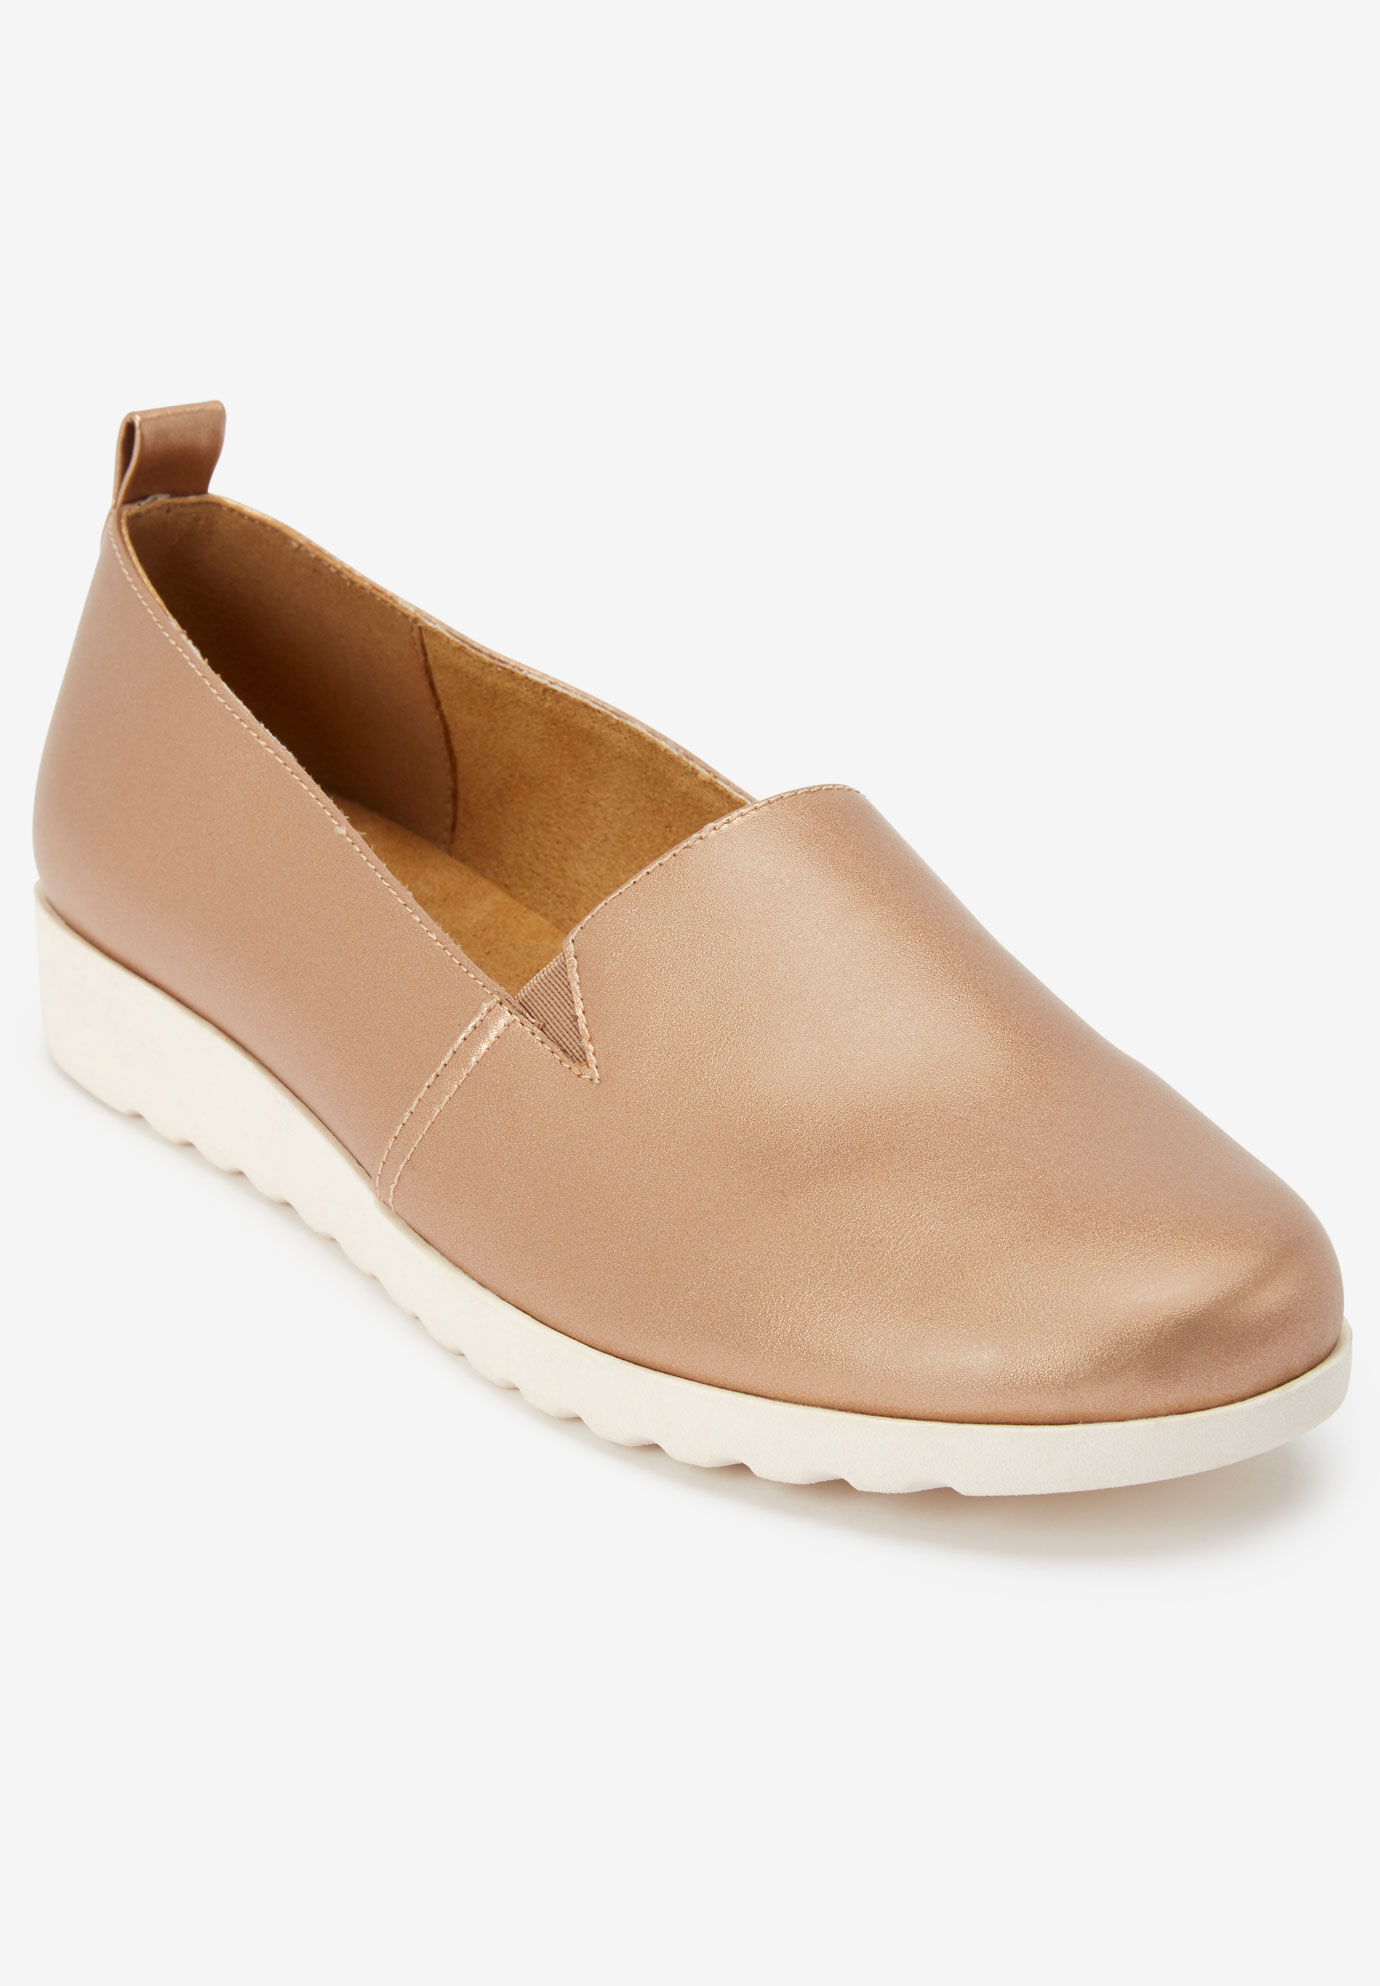 Wide Width Shoes \u0026 Wide Calf Boots